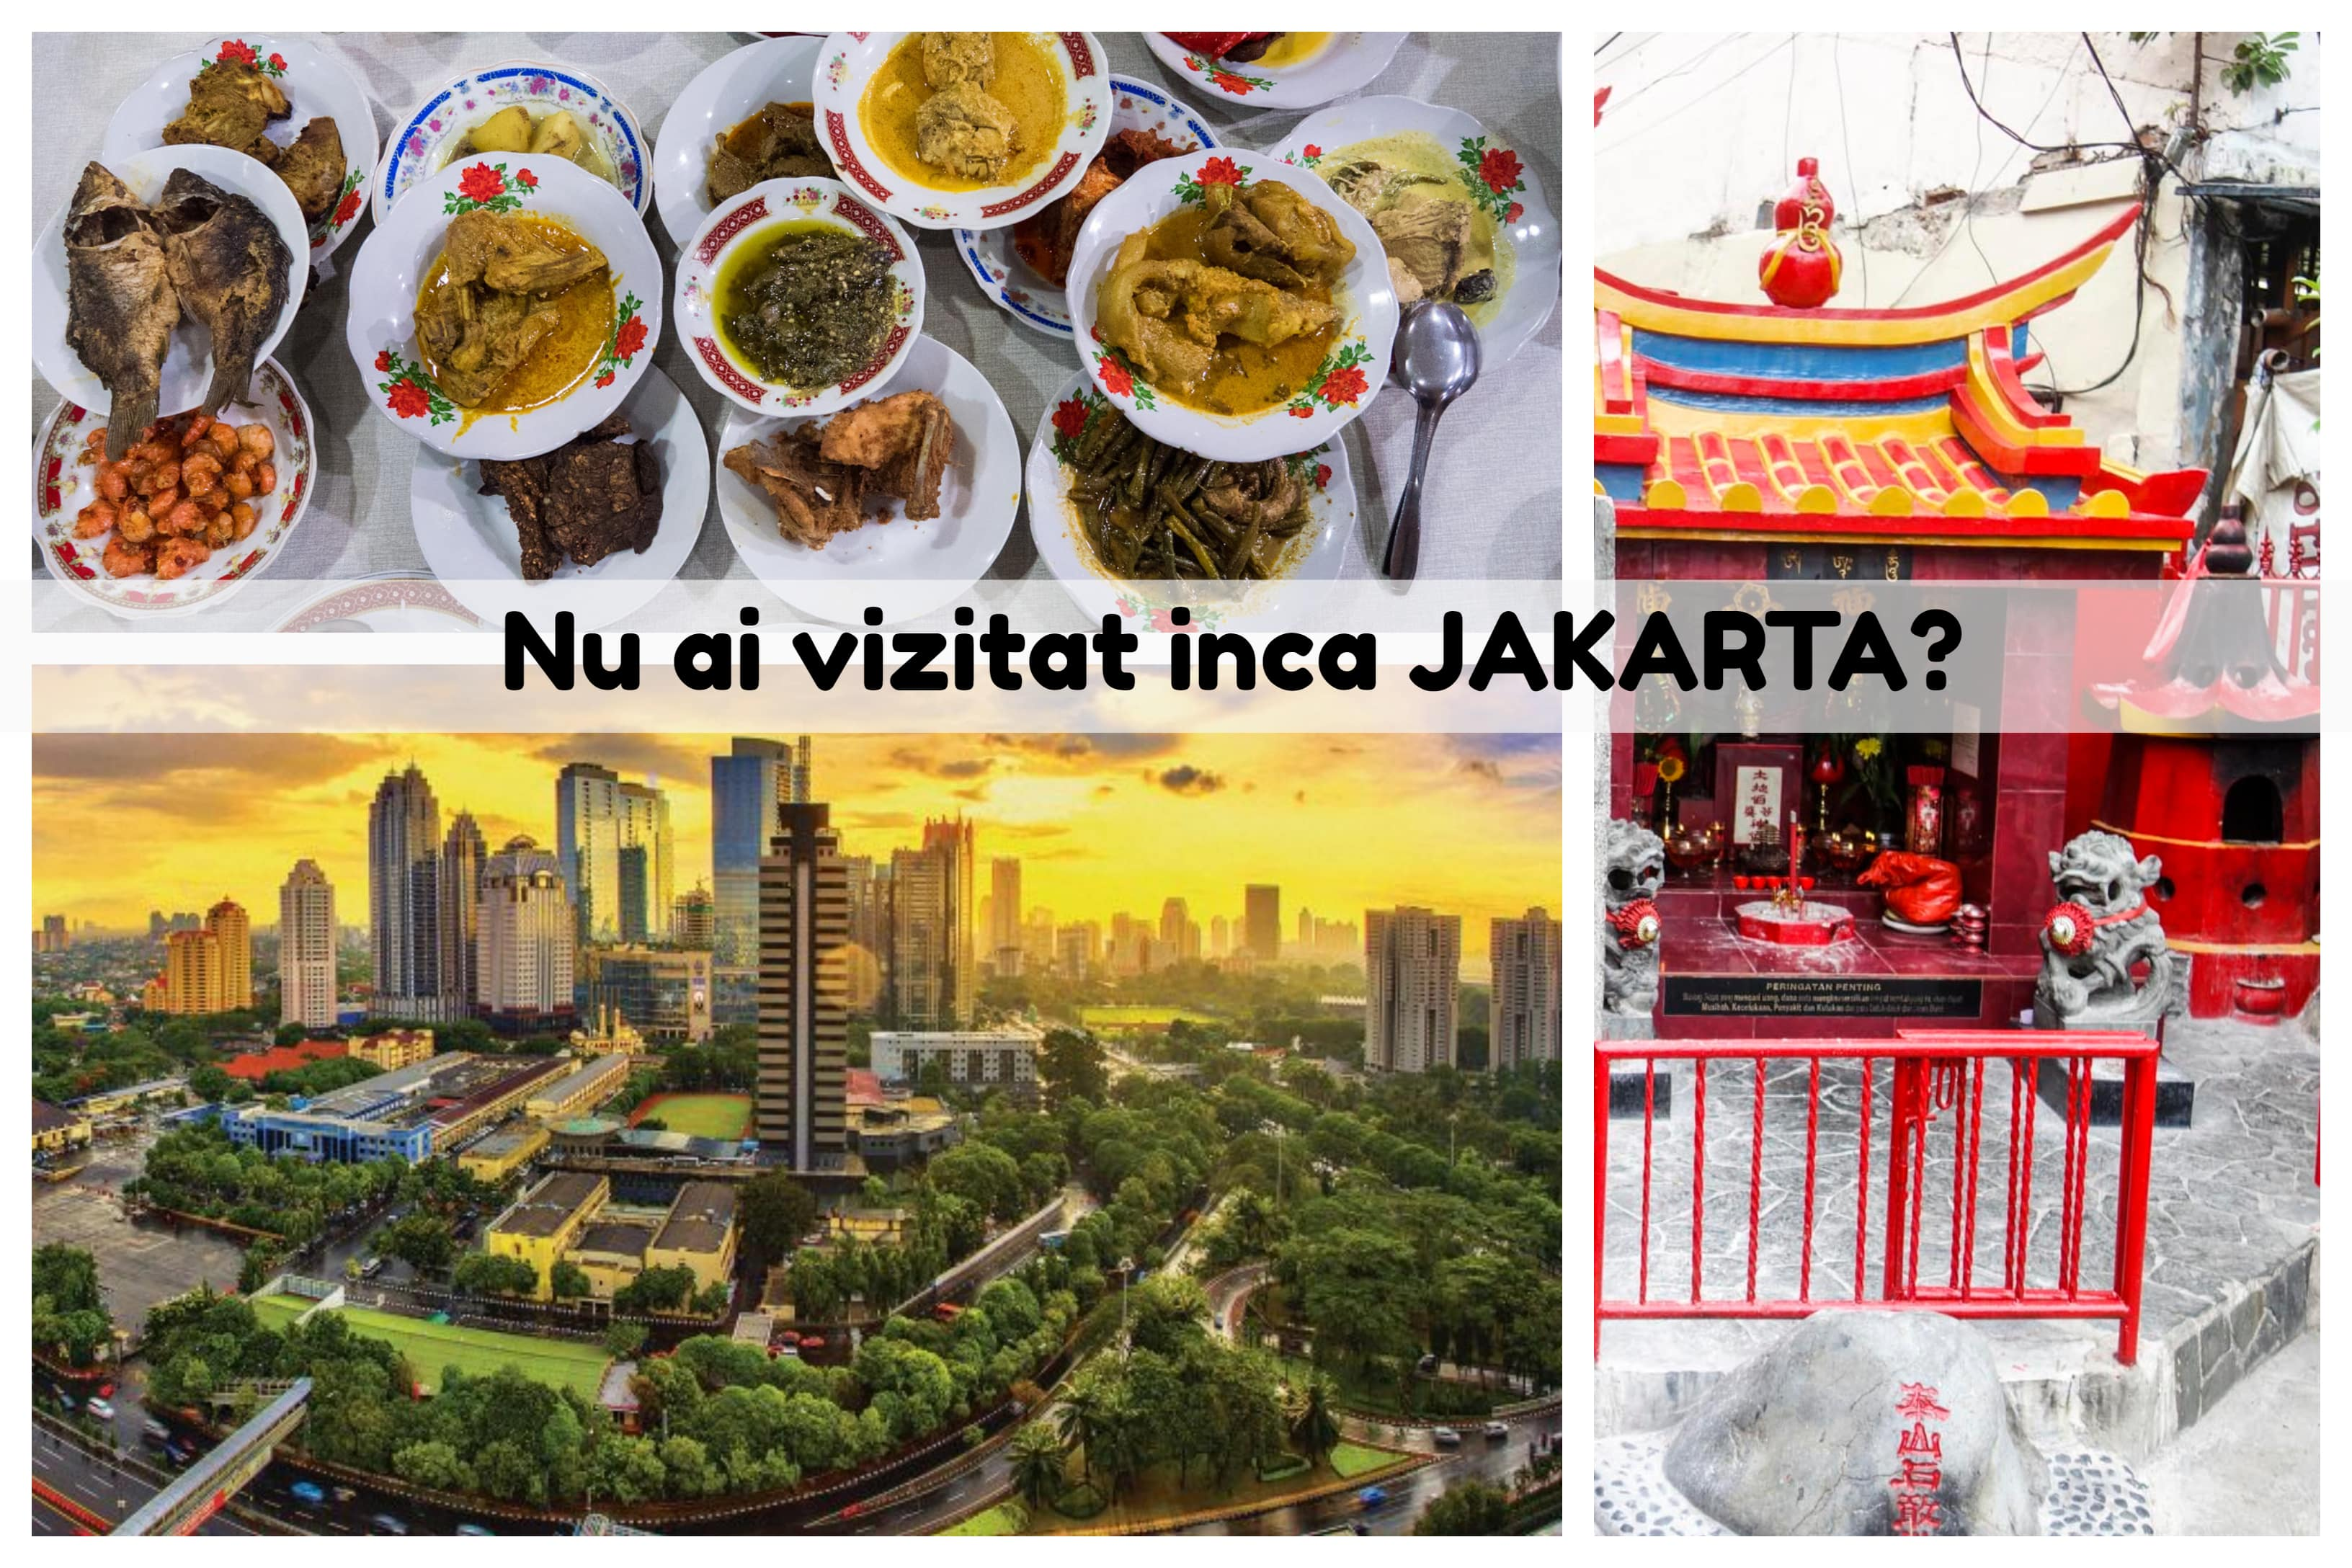 Oferta KLM Jakarta - imagini din Jakarta in ofertele KLM